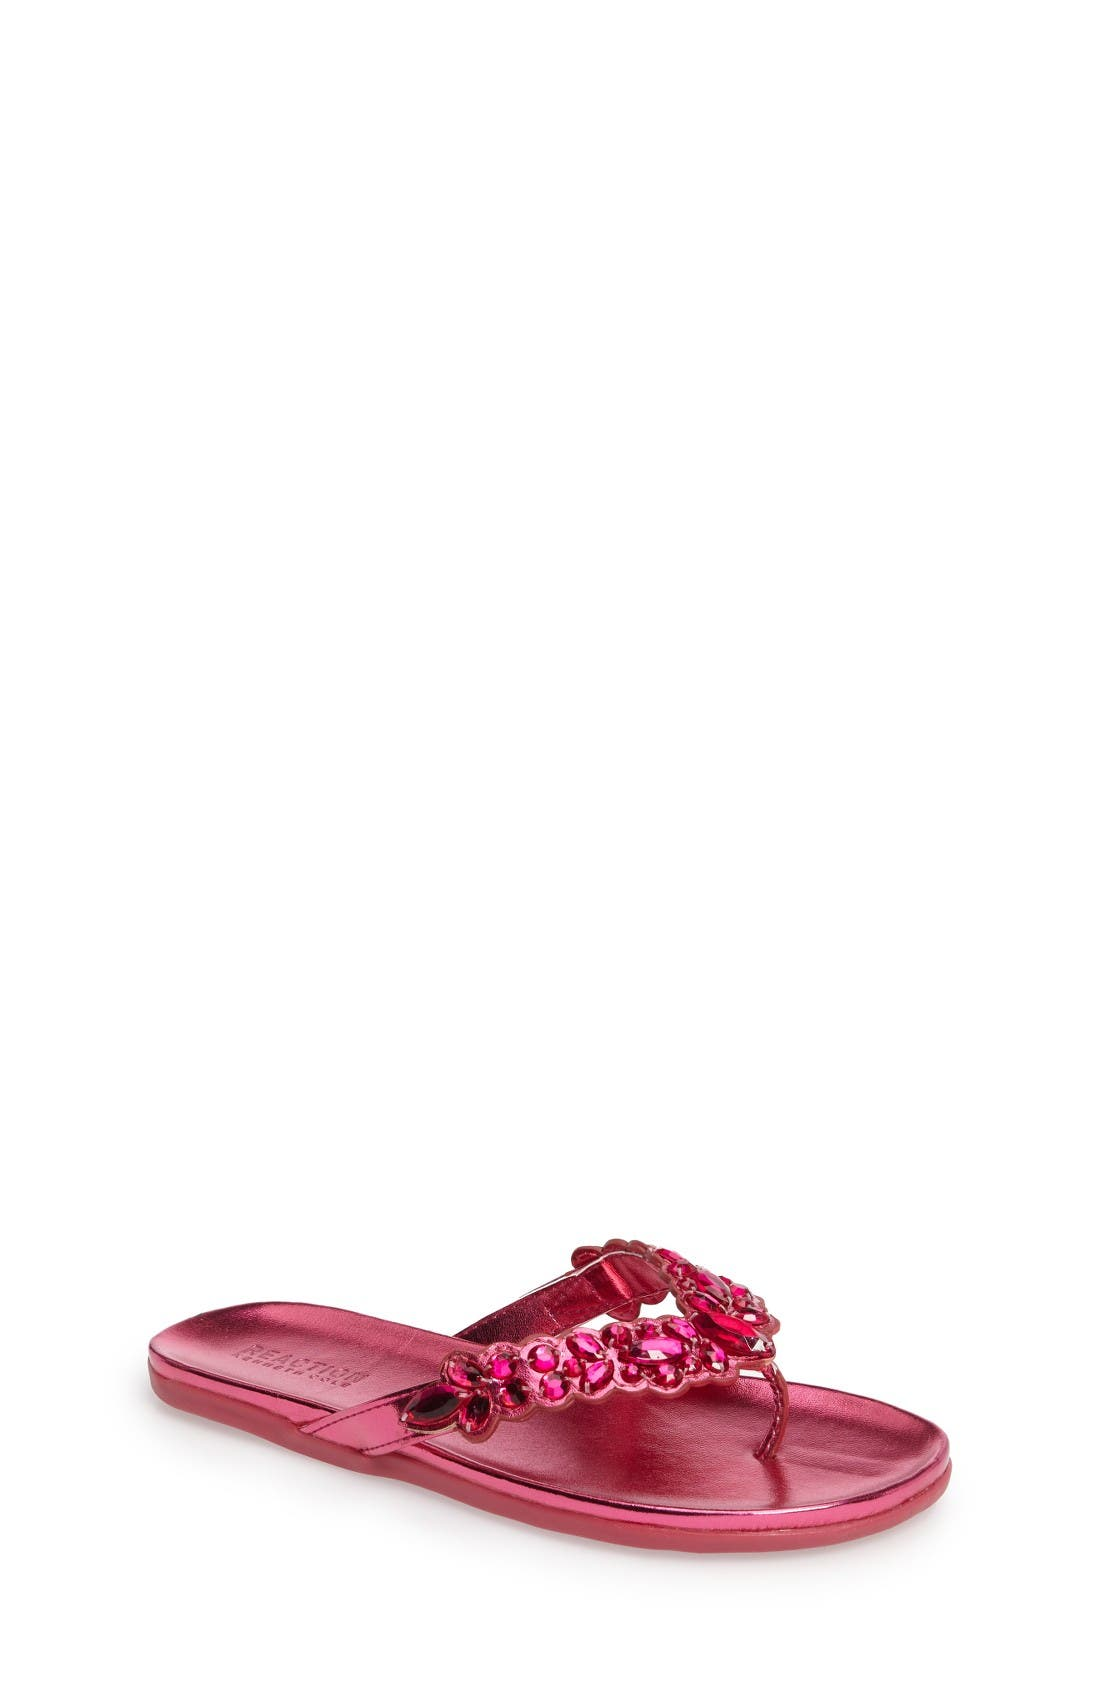 Slim Shadee Embellished Flip Flop,                         Main,                         color, Fuchsia